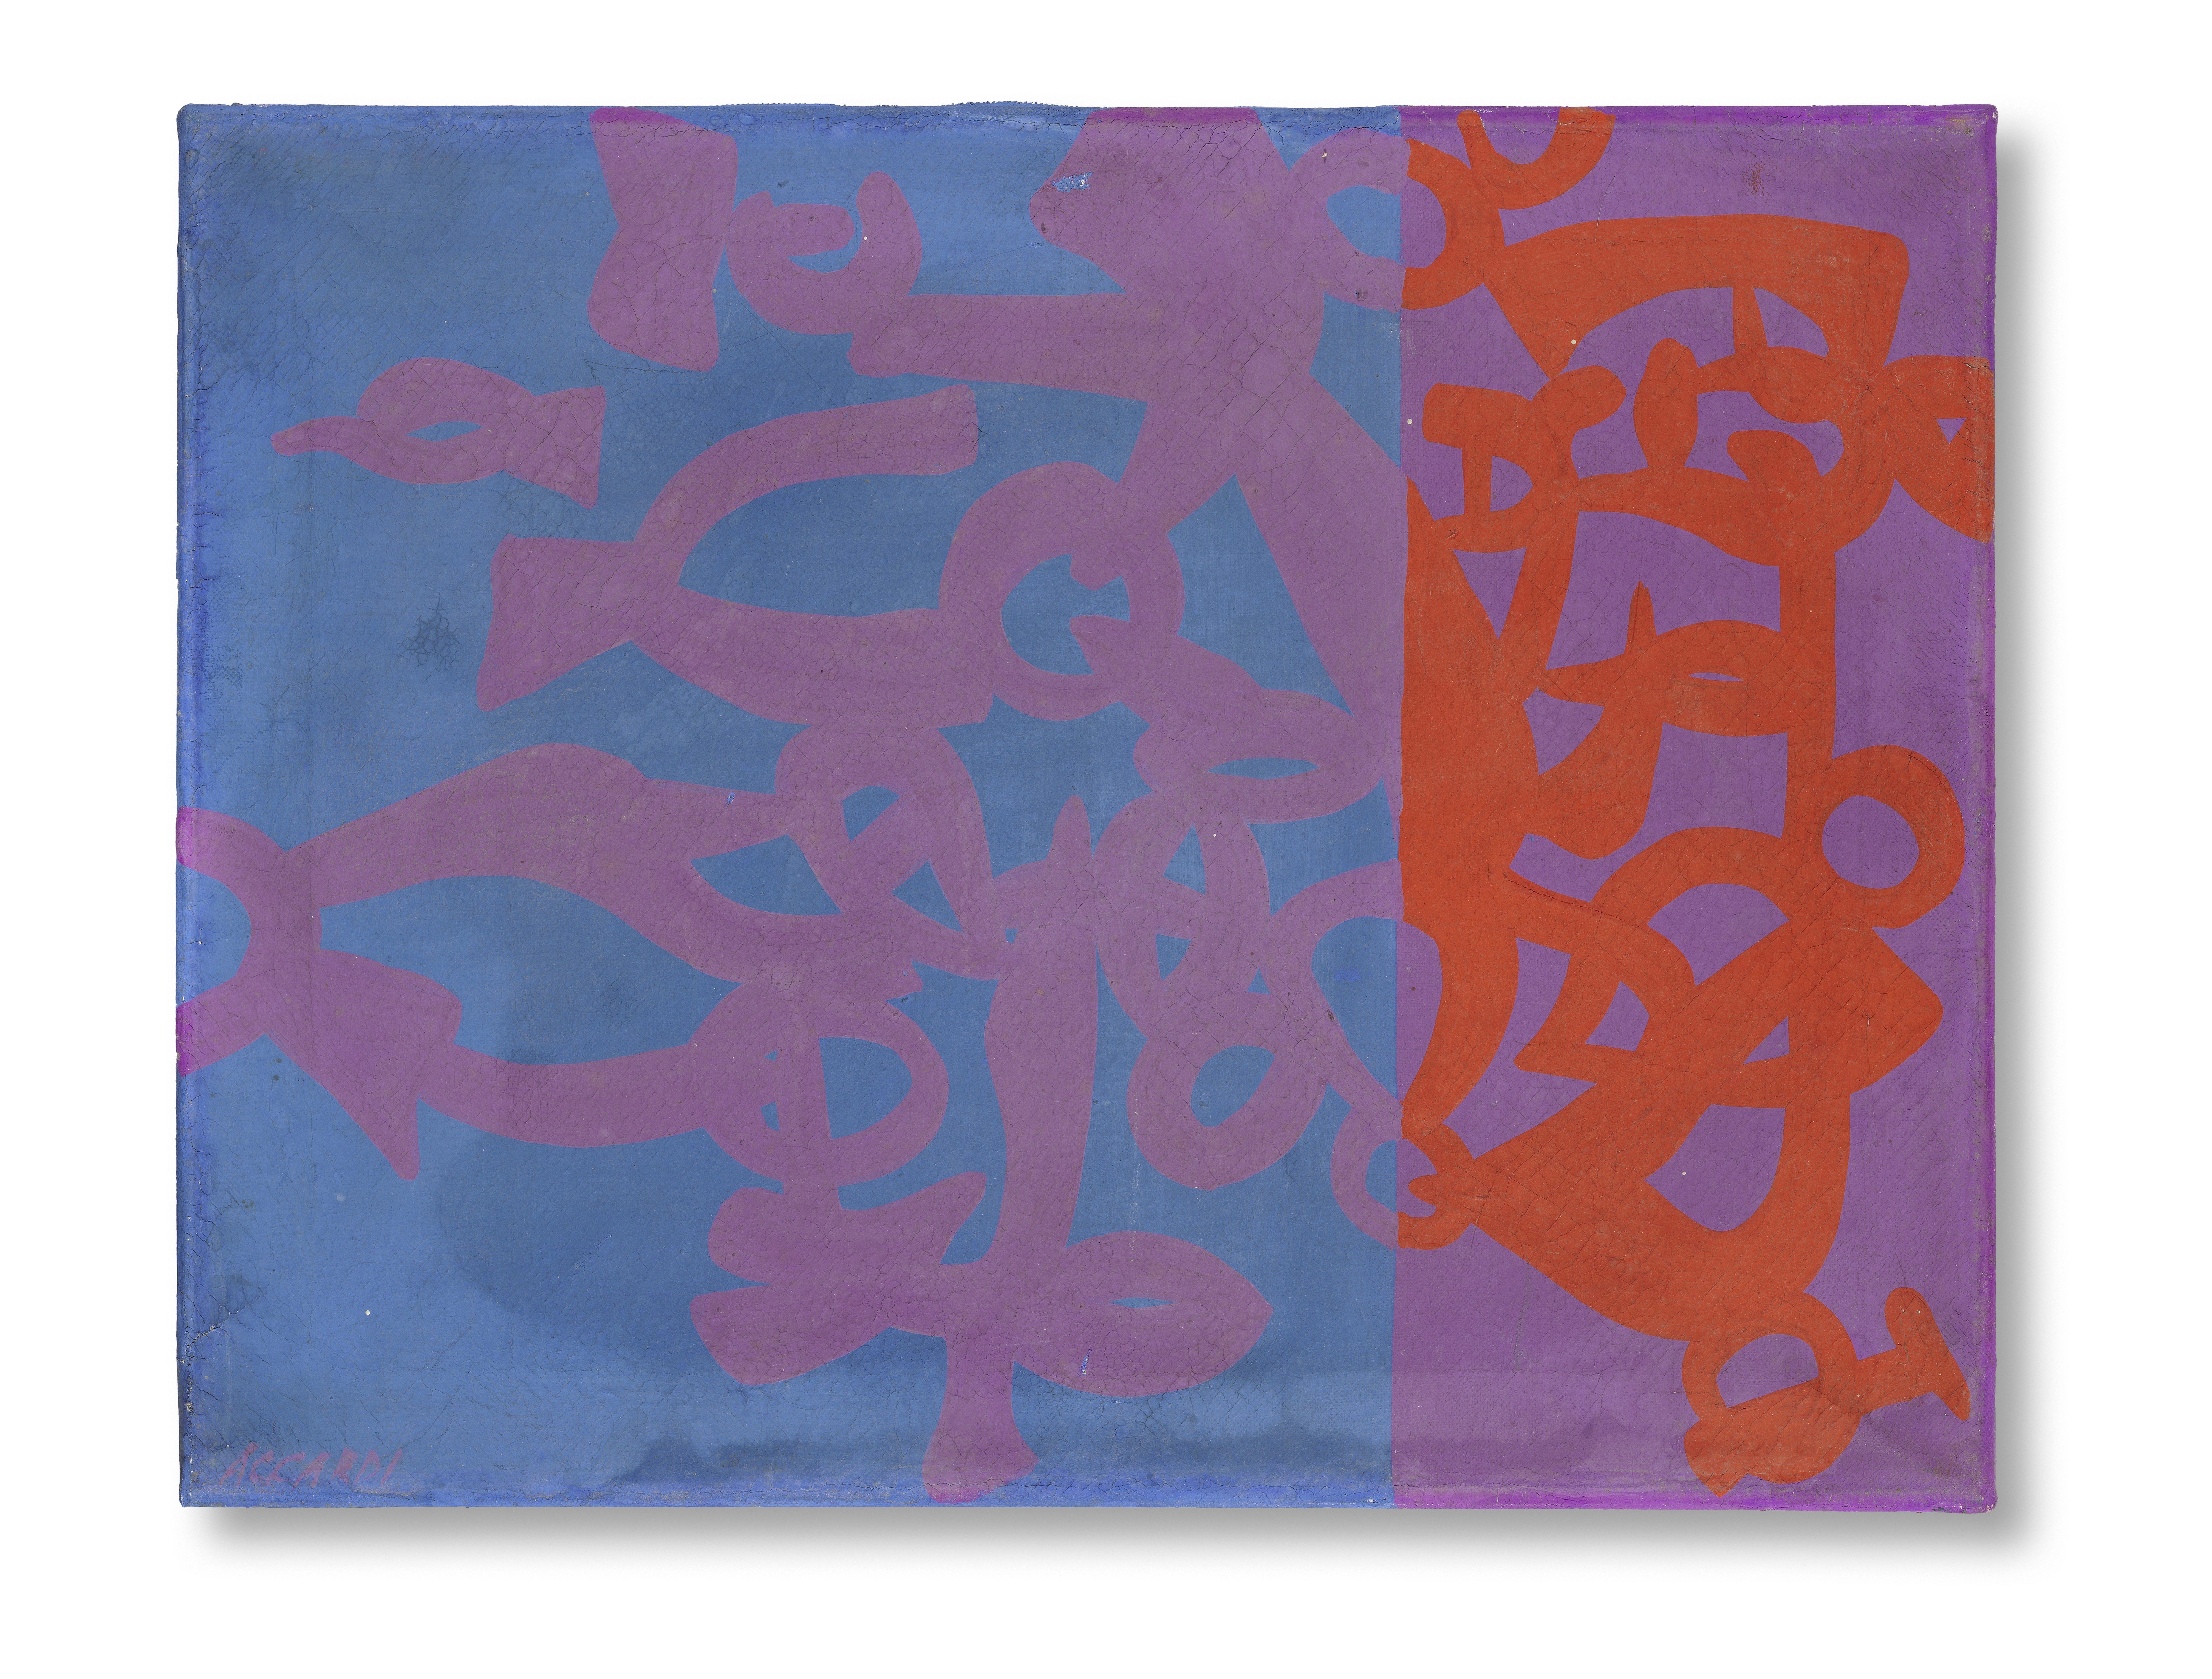 Lot 11 - Carla Accardi (1924-2014) Azzurro viola arancio, 1969 - 1970